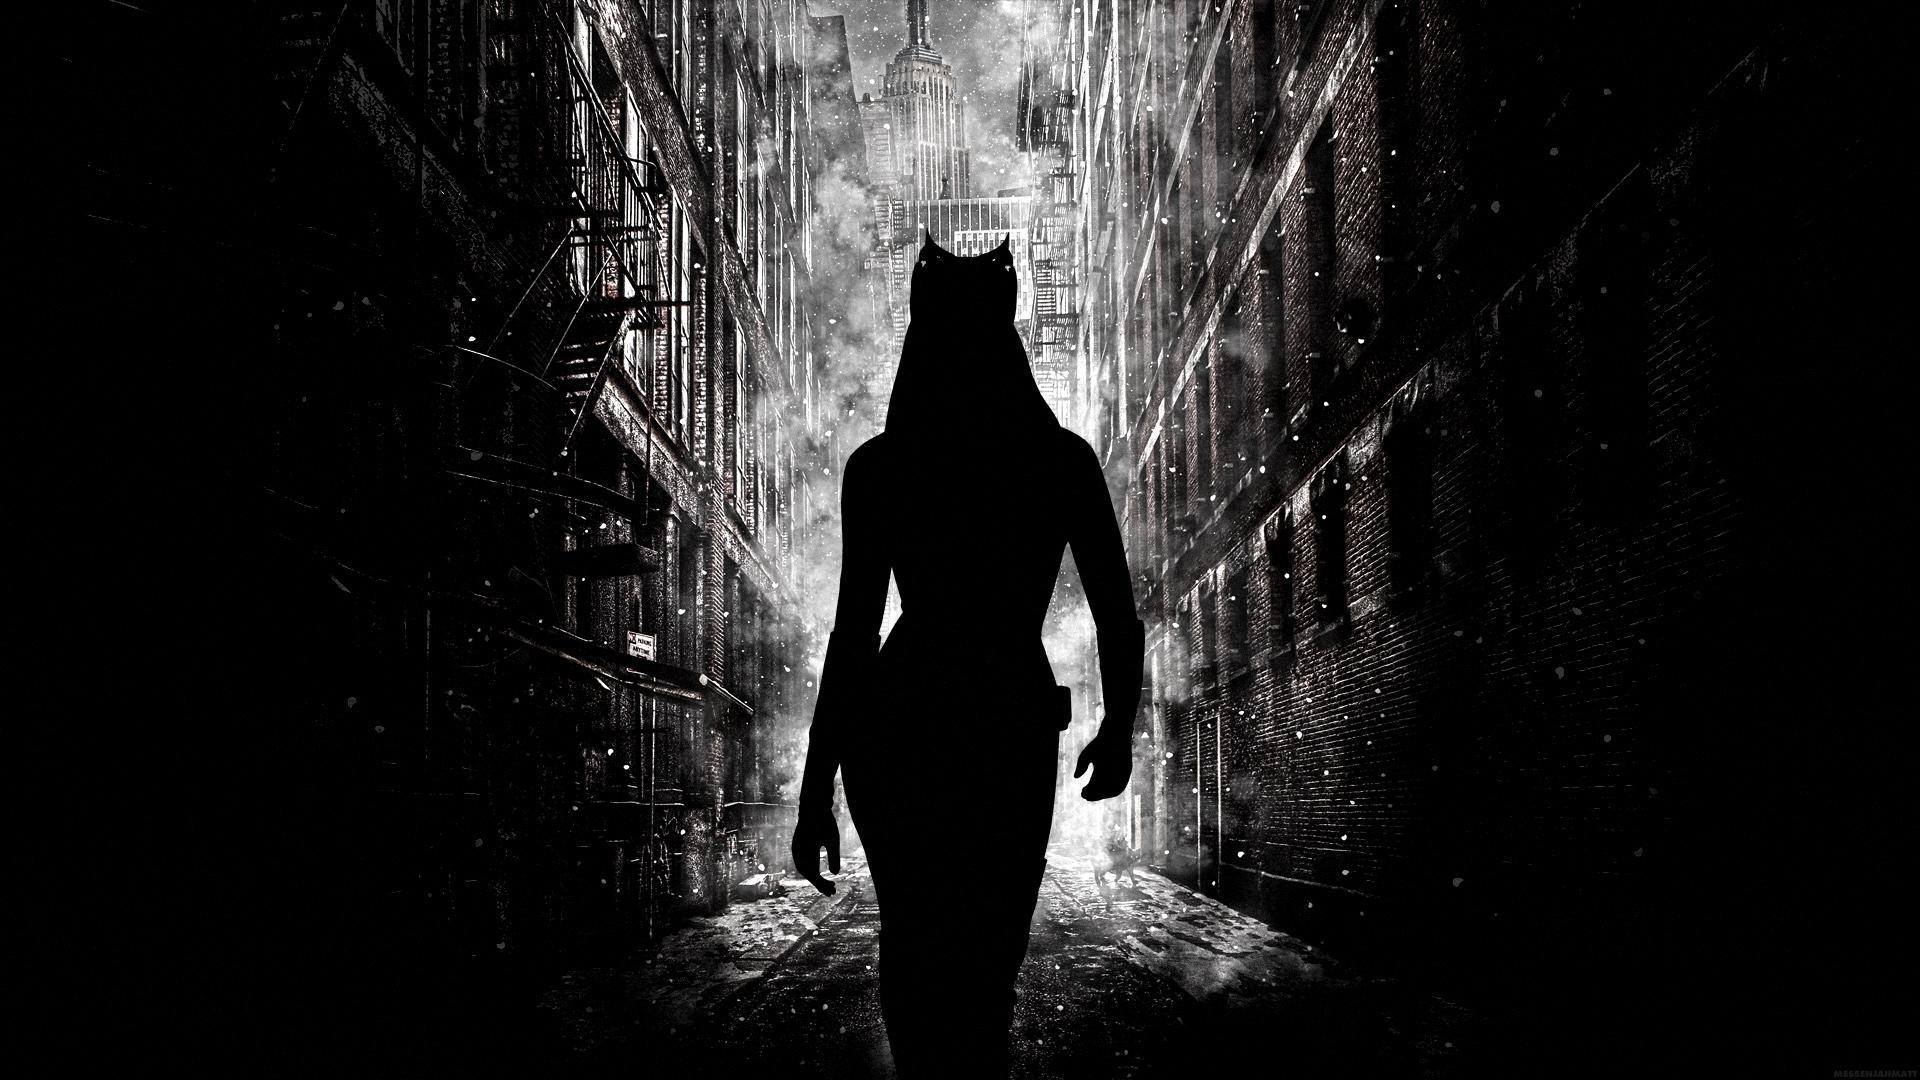 Dark Knight Rises Batman Superhero Bane Catwoman G Wallpaper